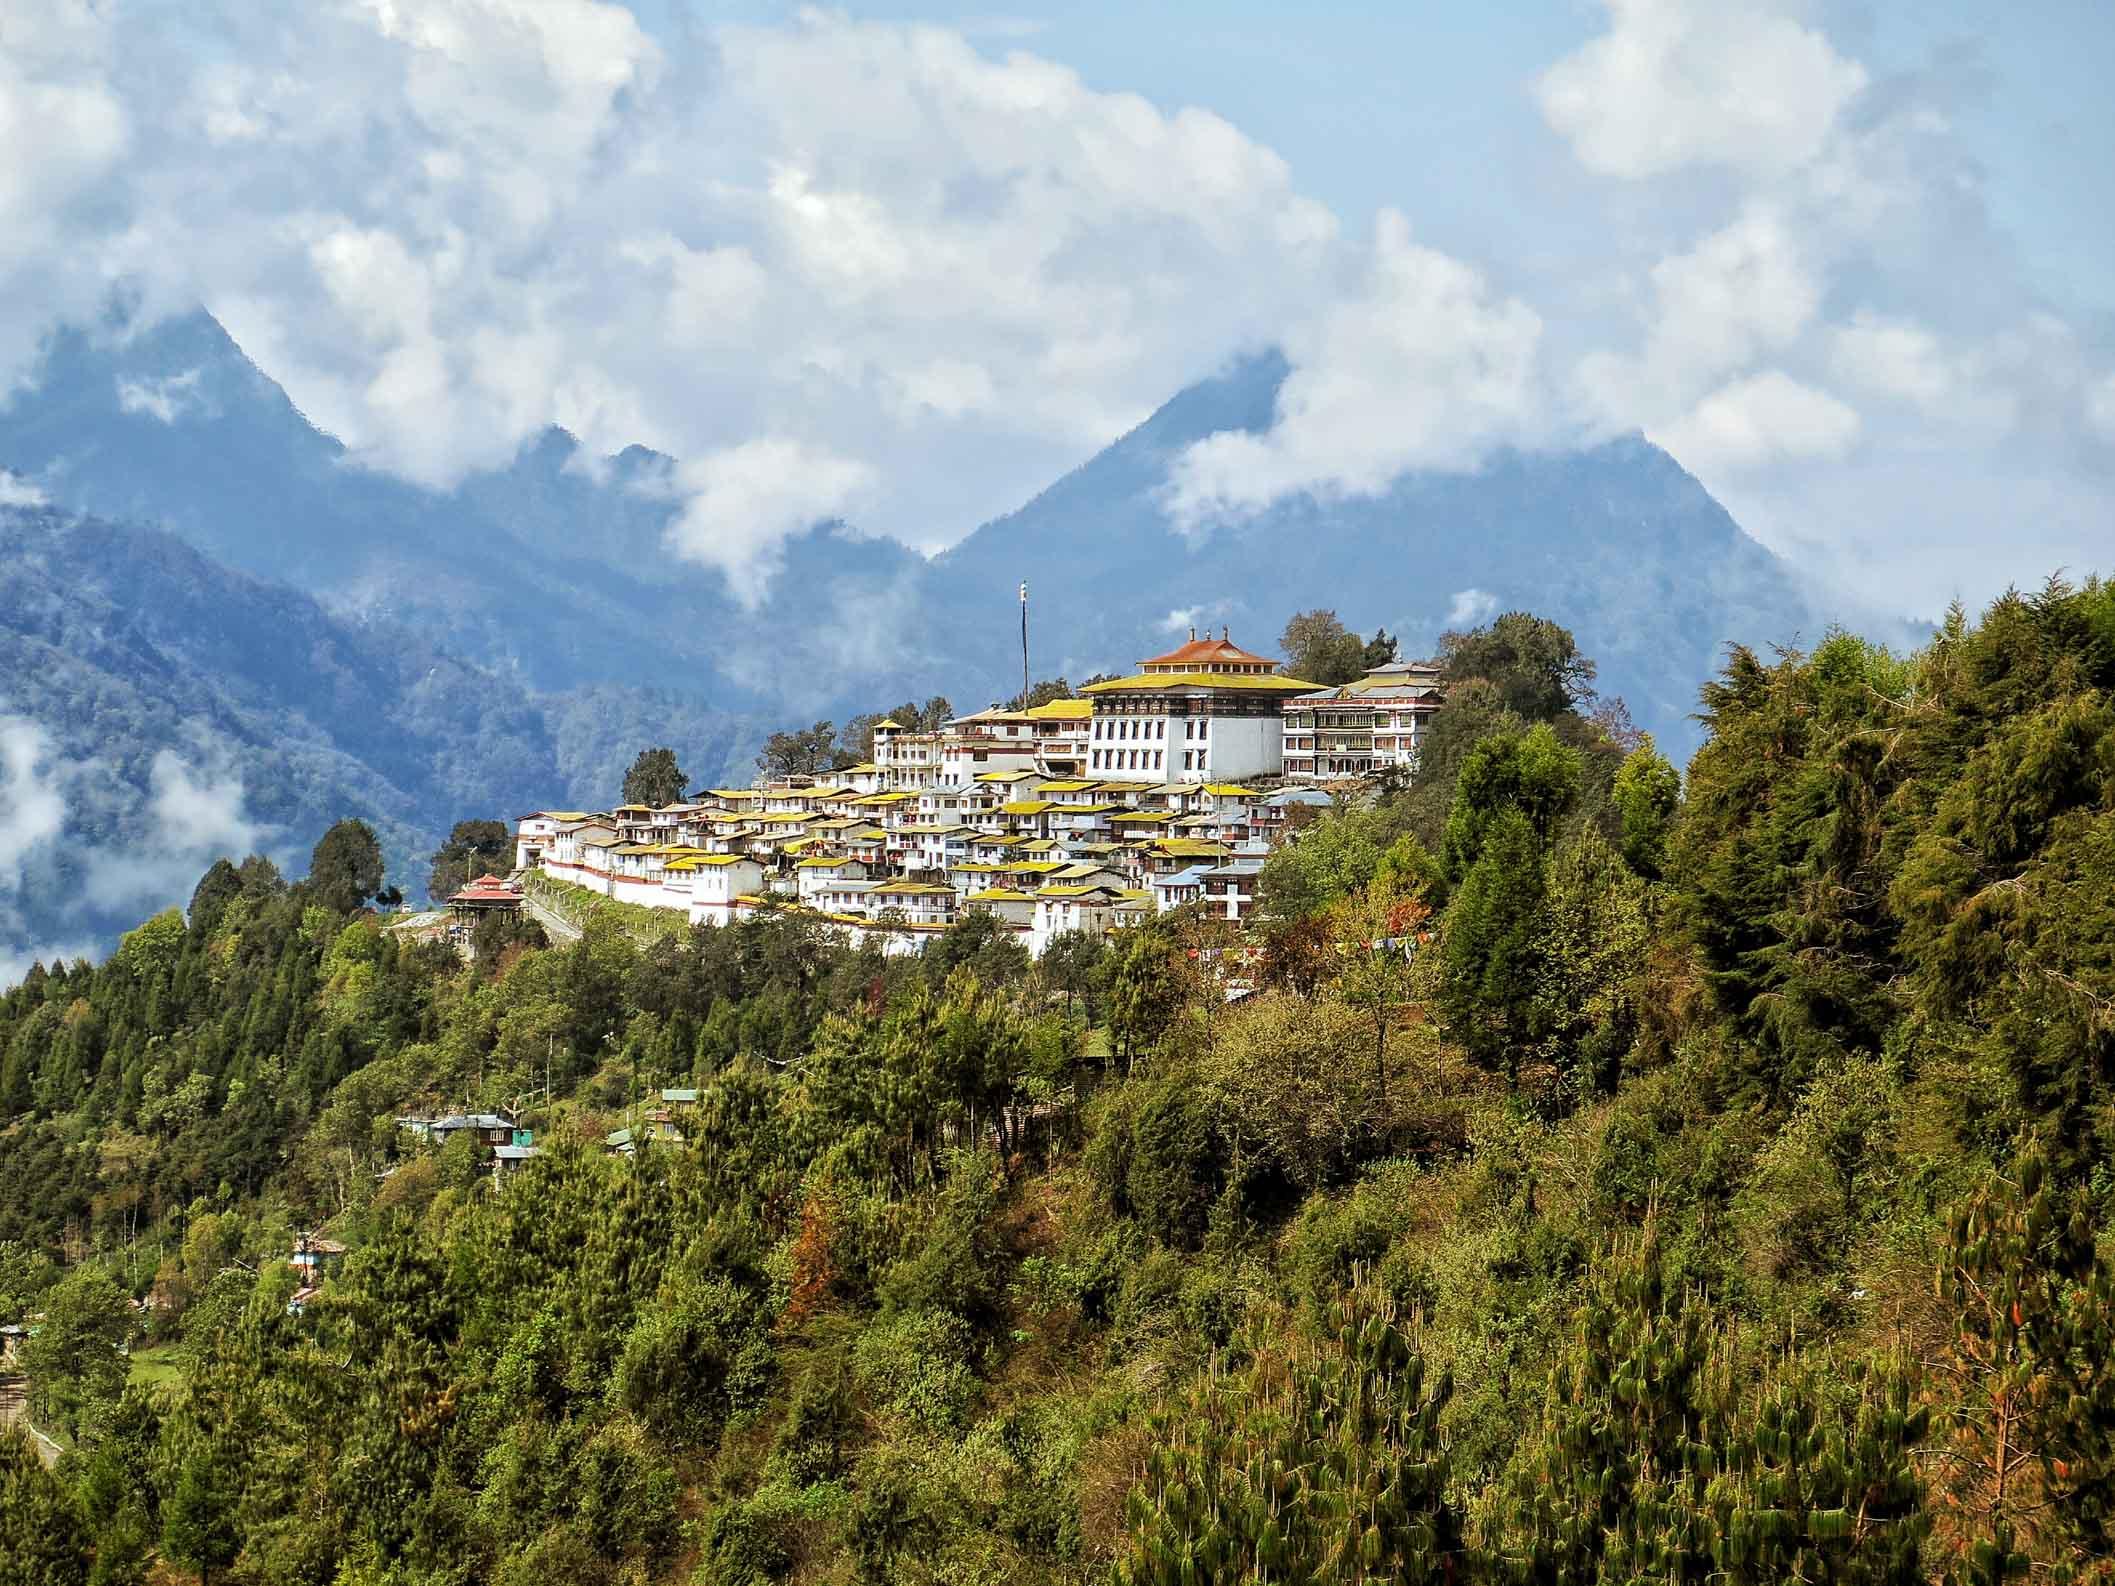 Tawang Monastery in india